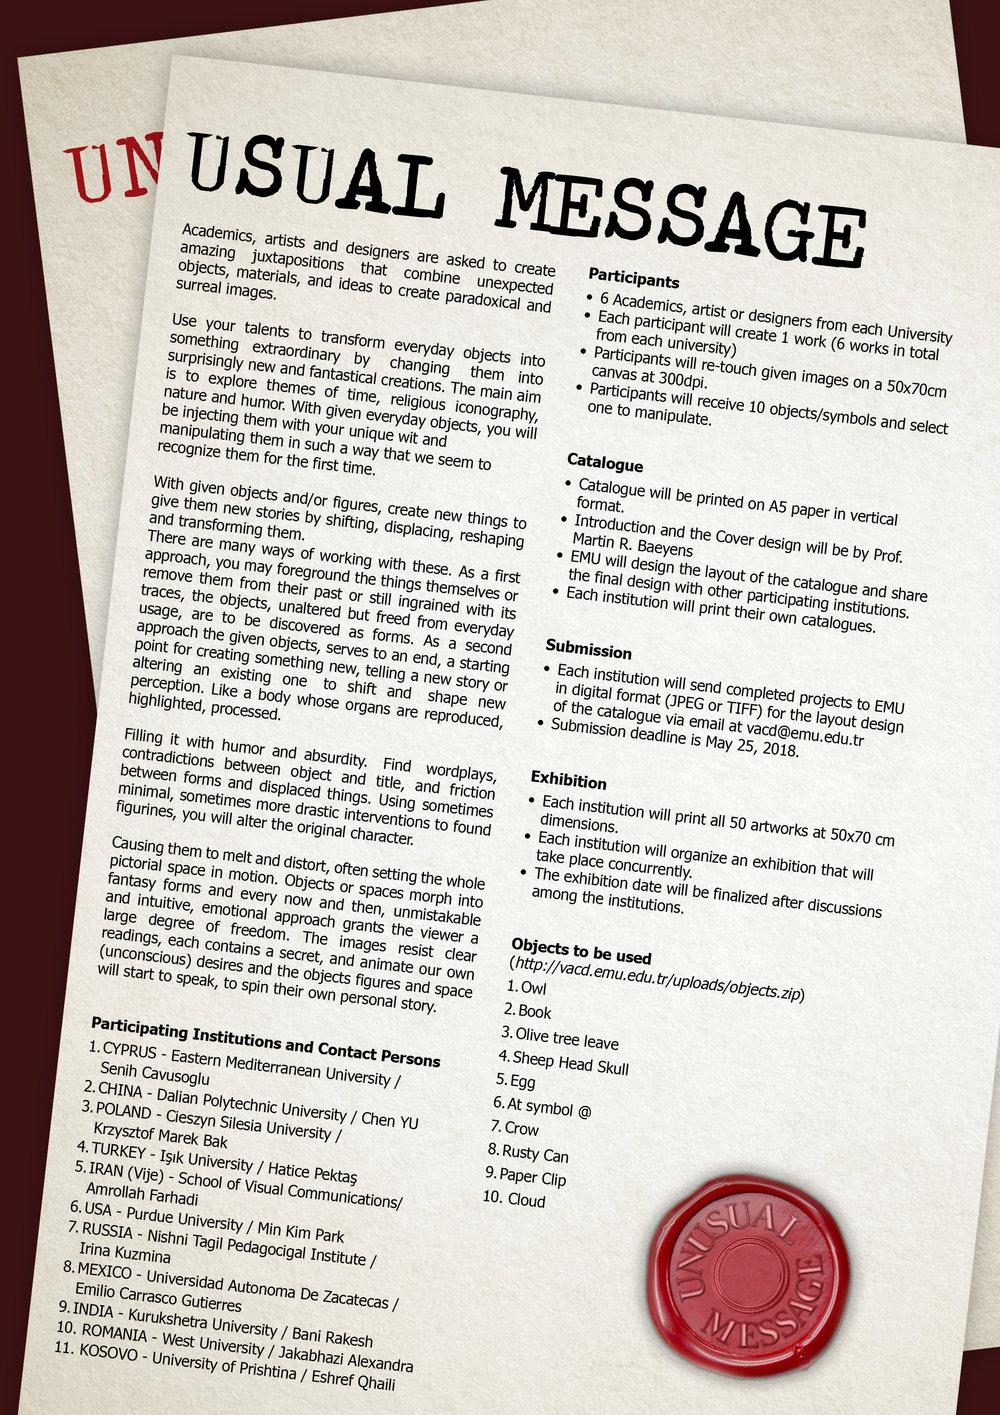 UnusualMessage_InvitationDesign_Final_Corrected(3).jpg